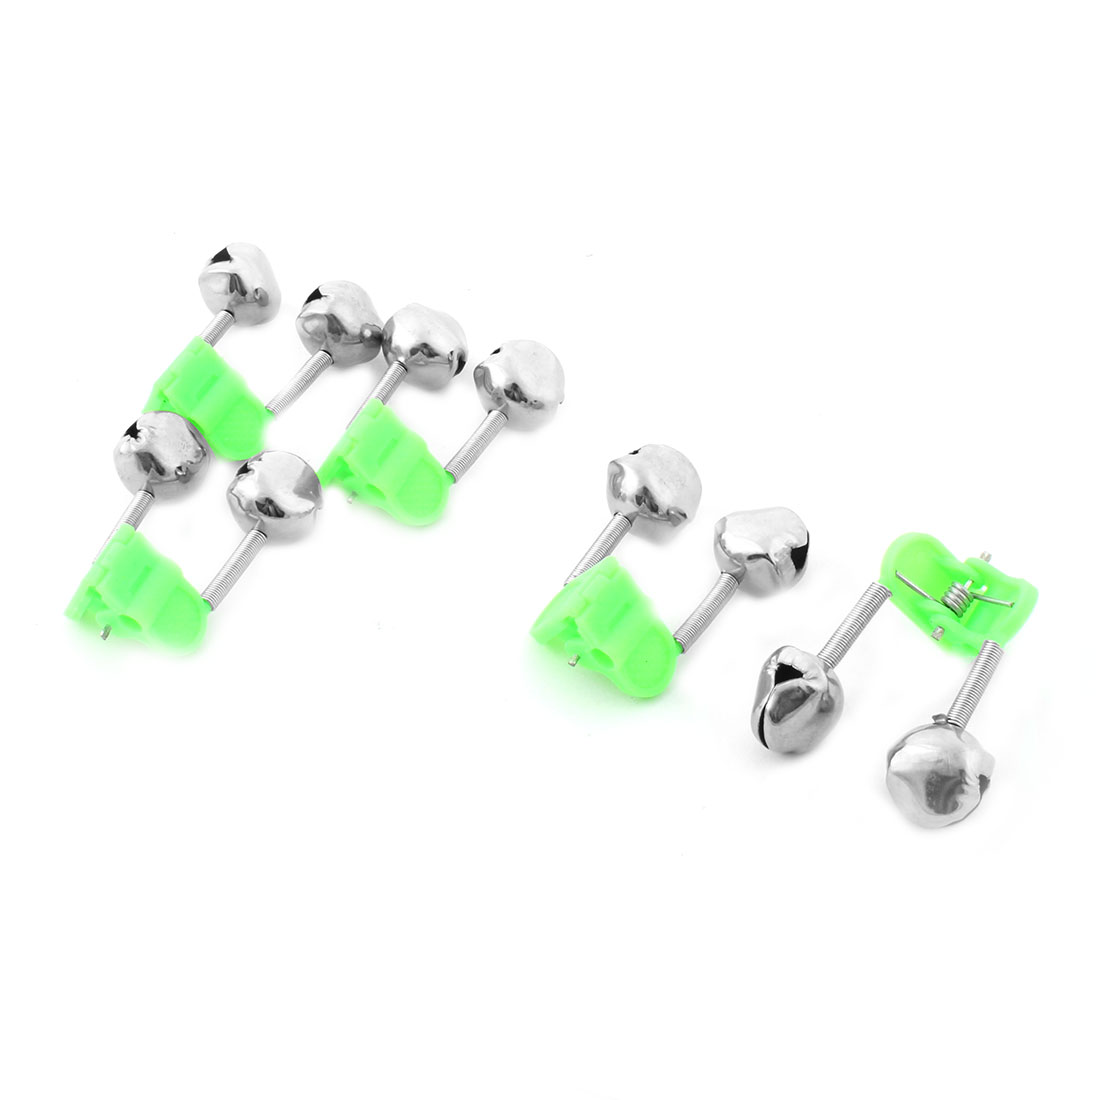 5 Pcs Green Plastic Clip Metal Dual Rod Fishing Bell